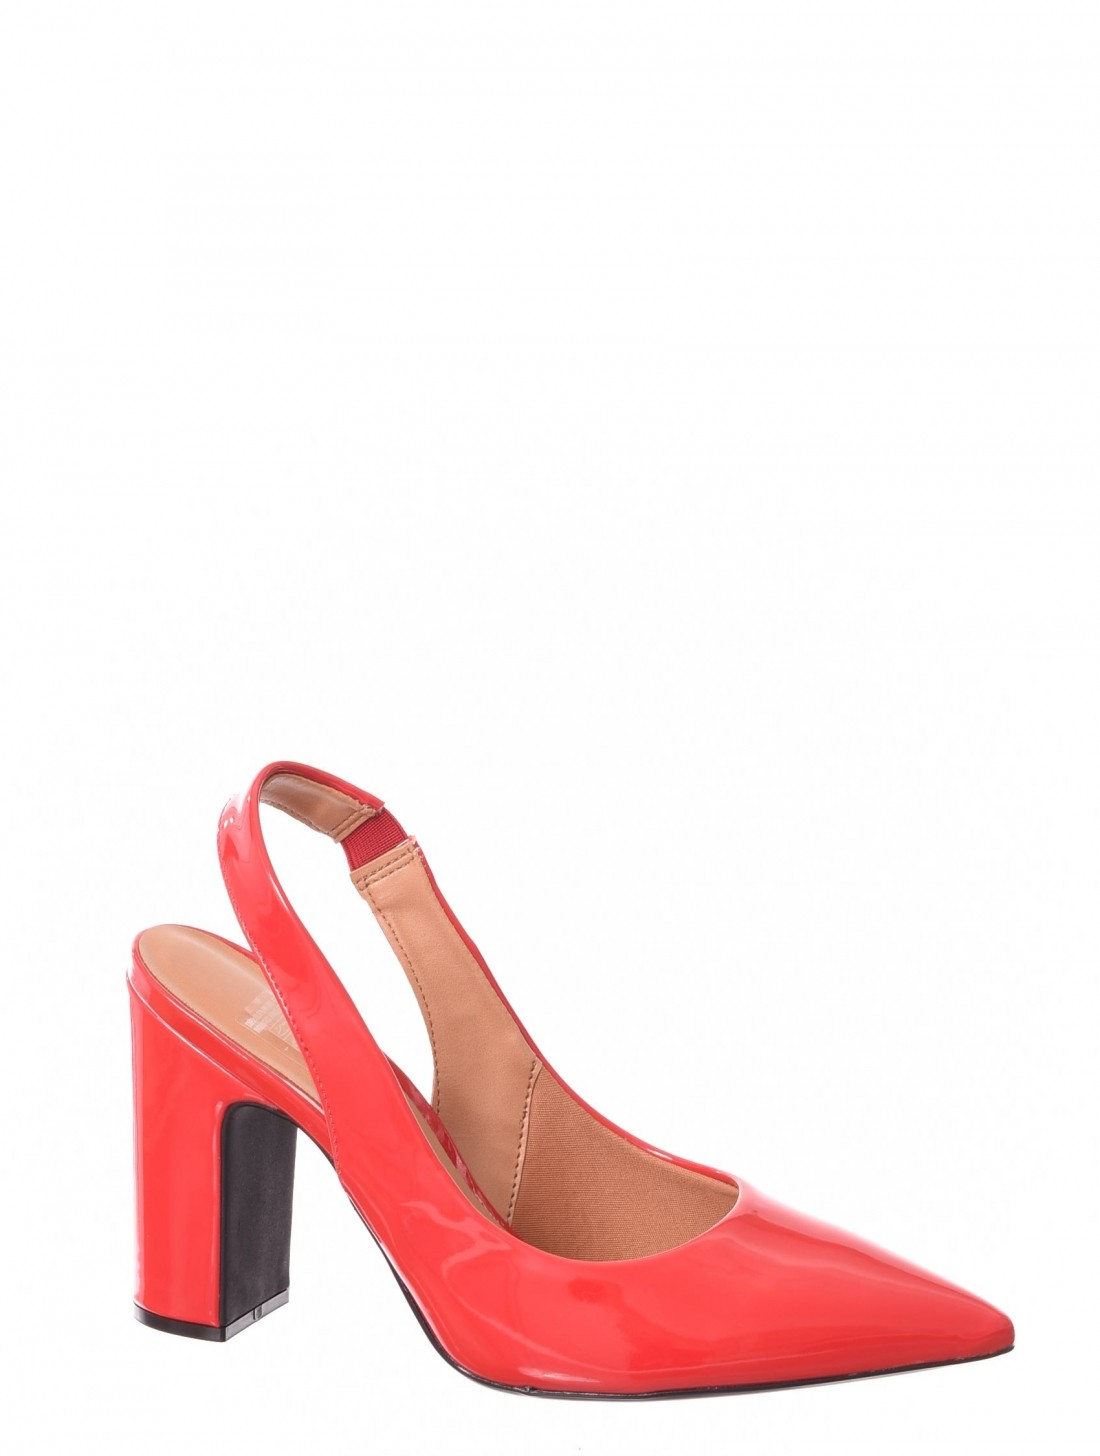 d9a0d341be Sapato Chanel Vizzano Verniz Bico Fino Detalhe Elástico Vermelho ...